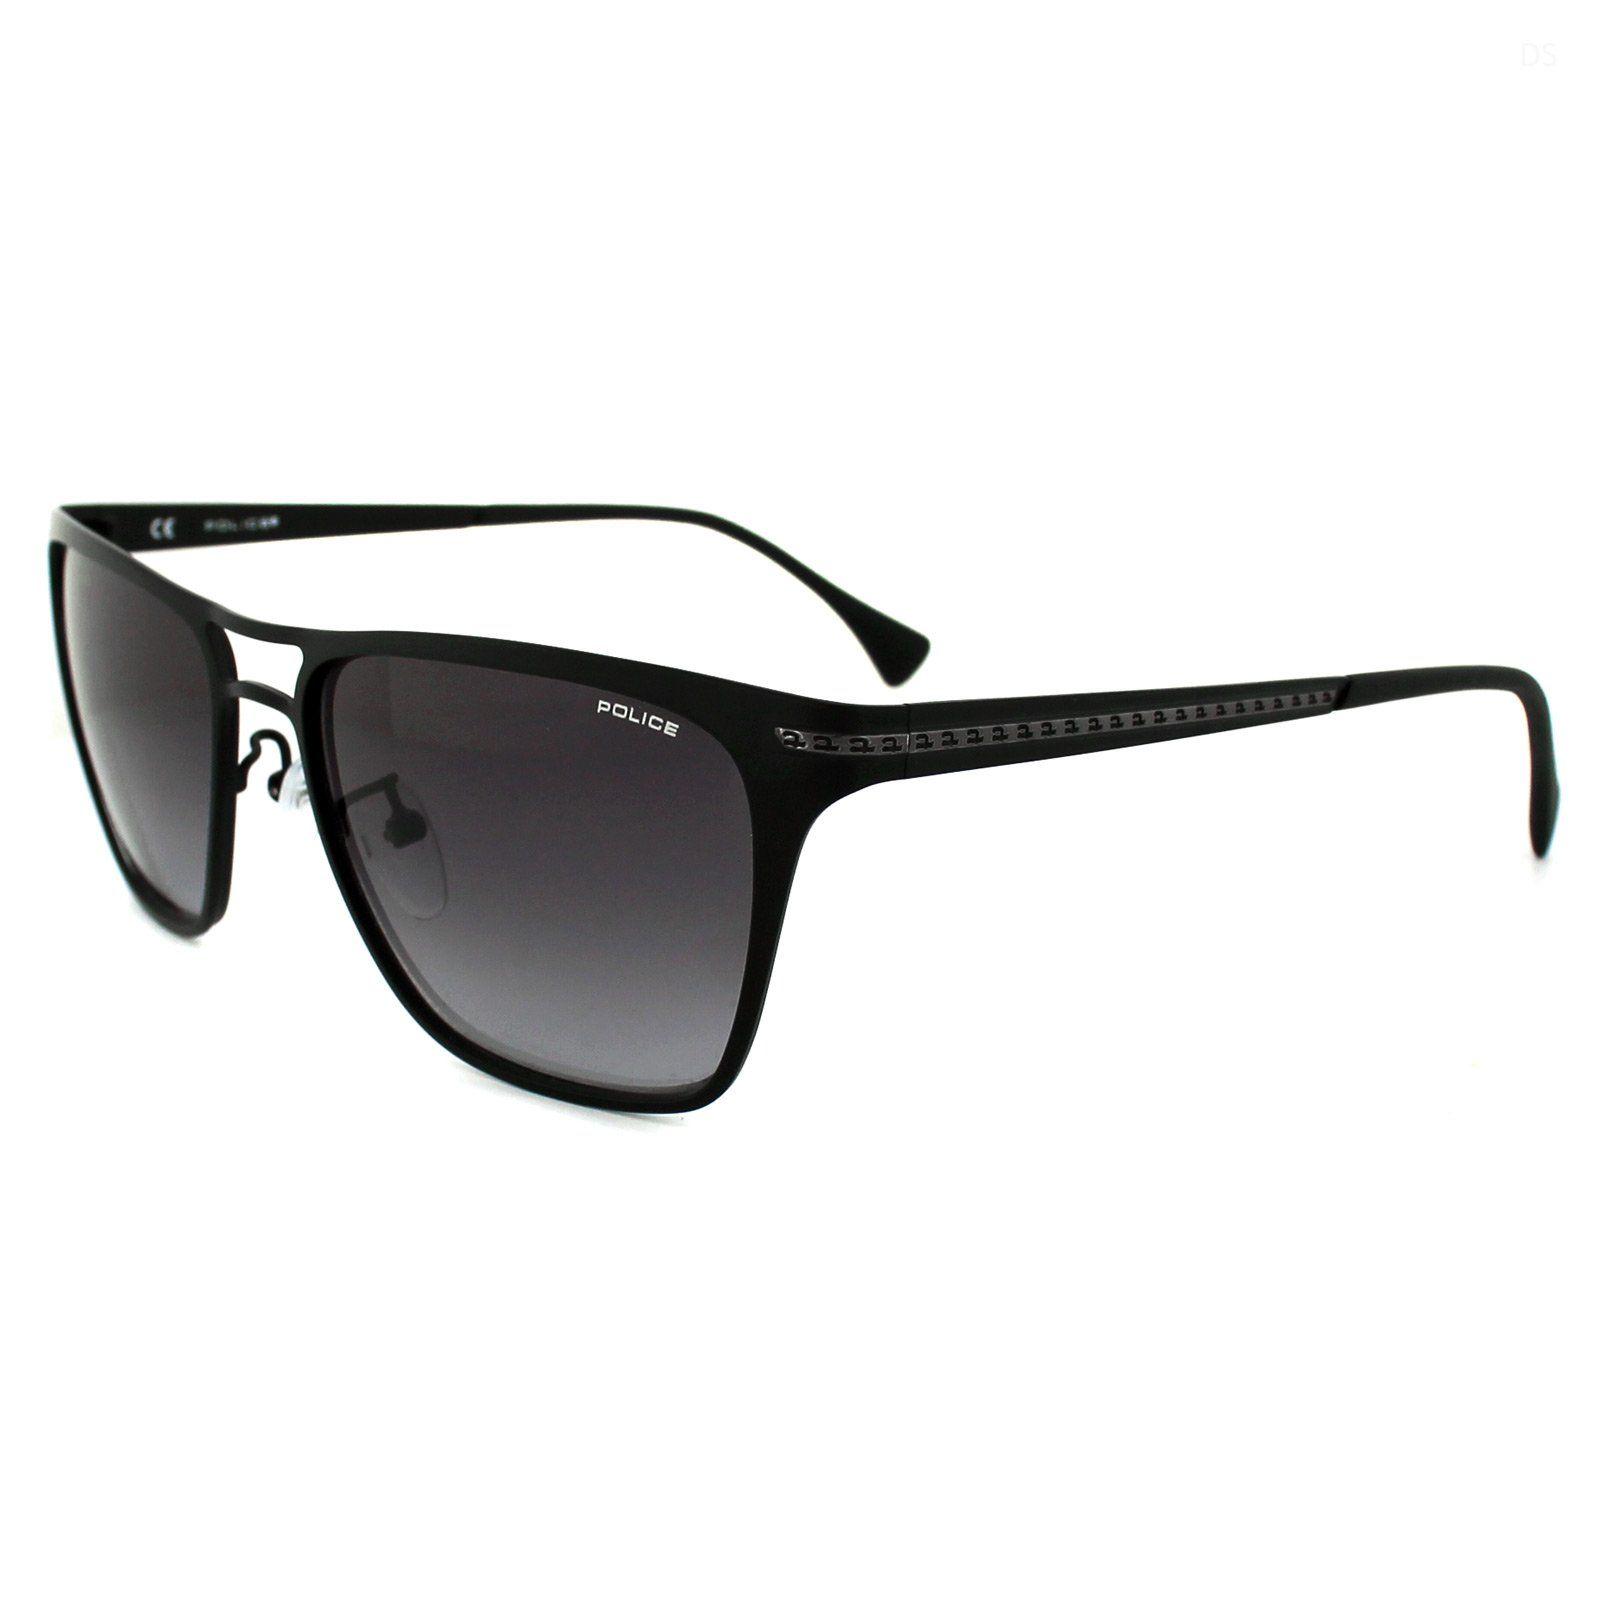 Police Sunglasses S 8751 0531 Metal Mat black Gra nt grey black